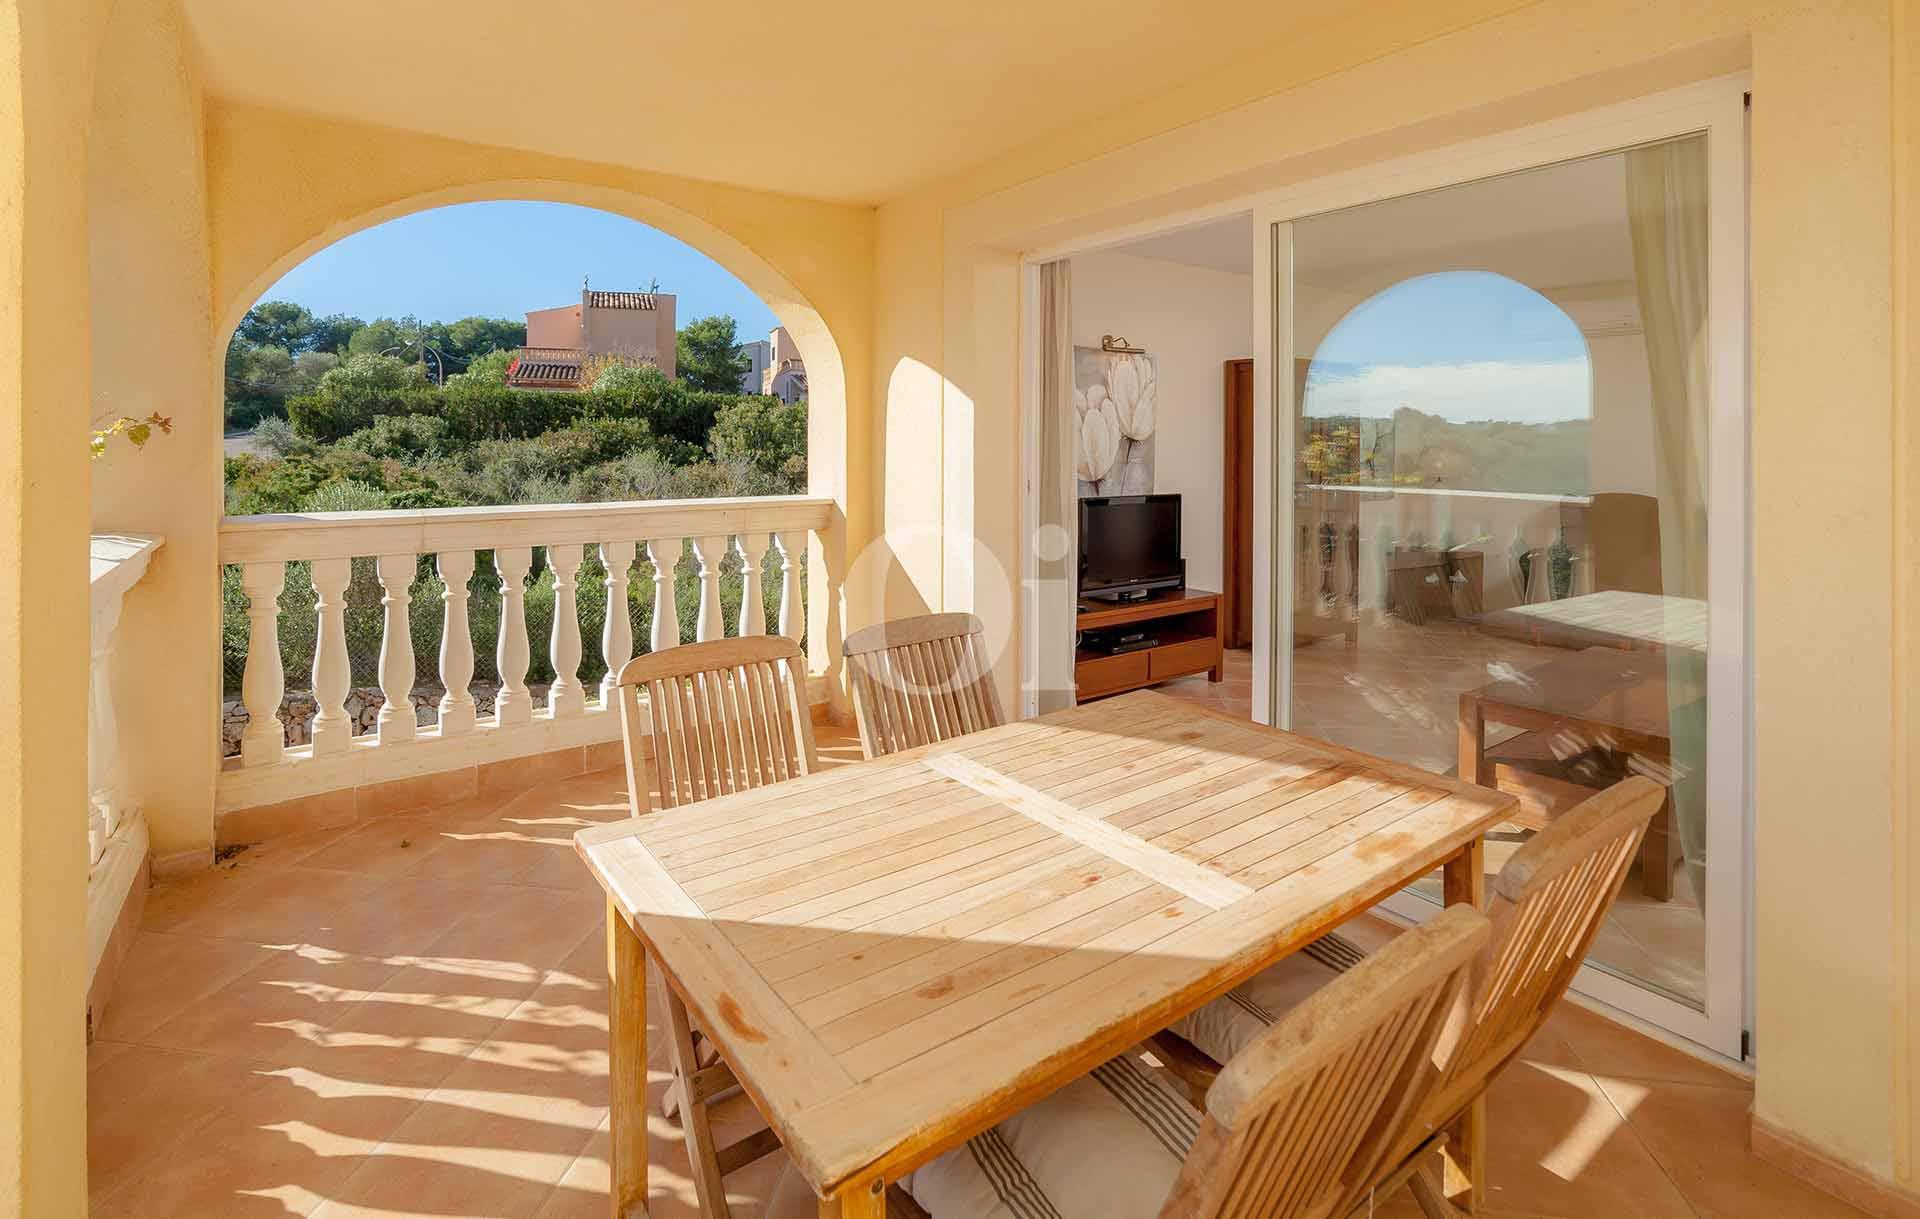 Comedor de verano de apartamento en venta en Porto Cristo, Mallorca